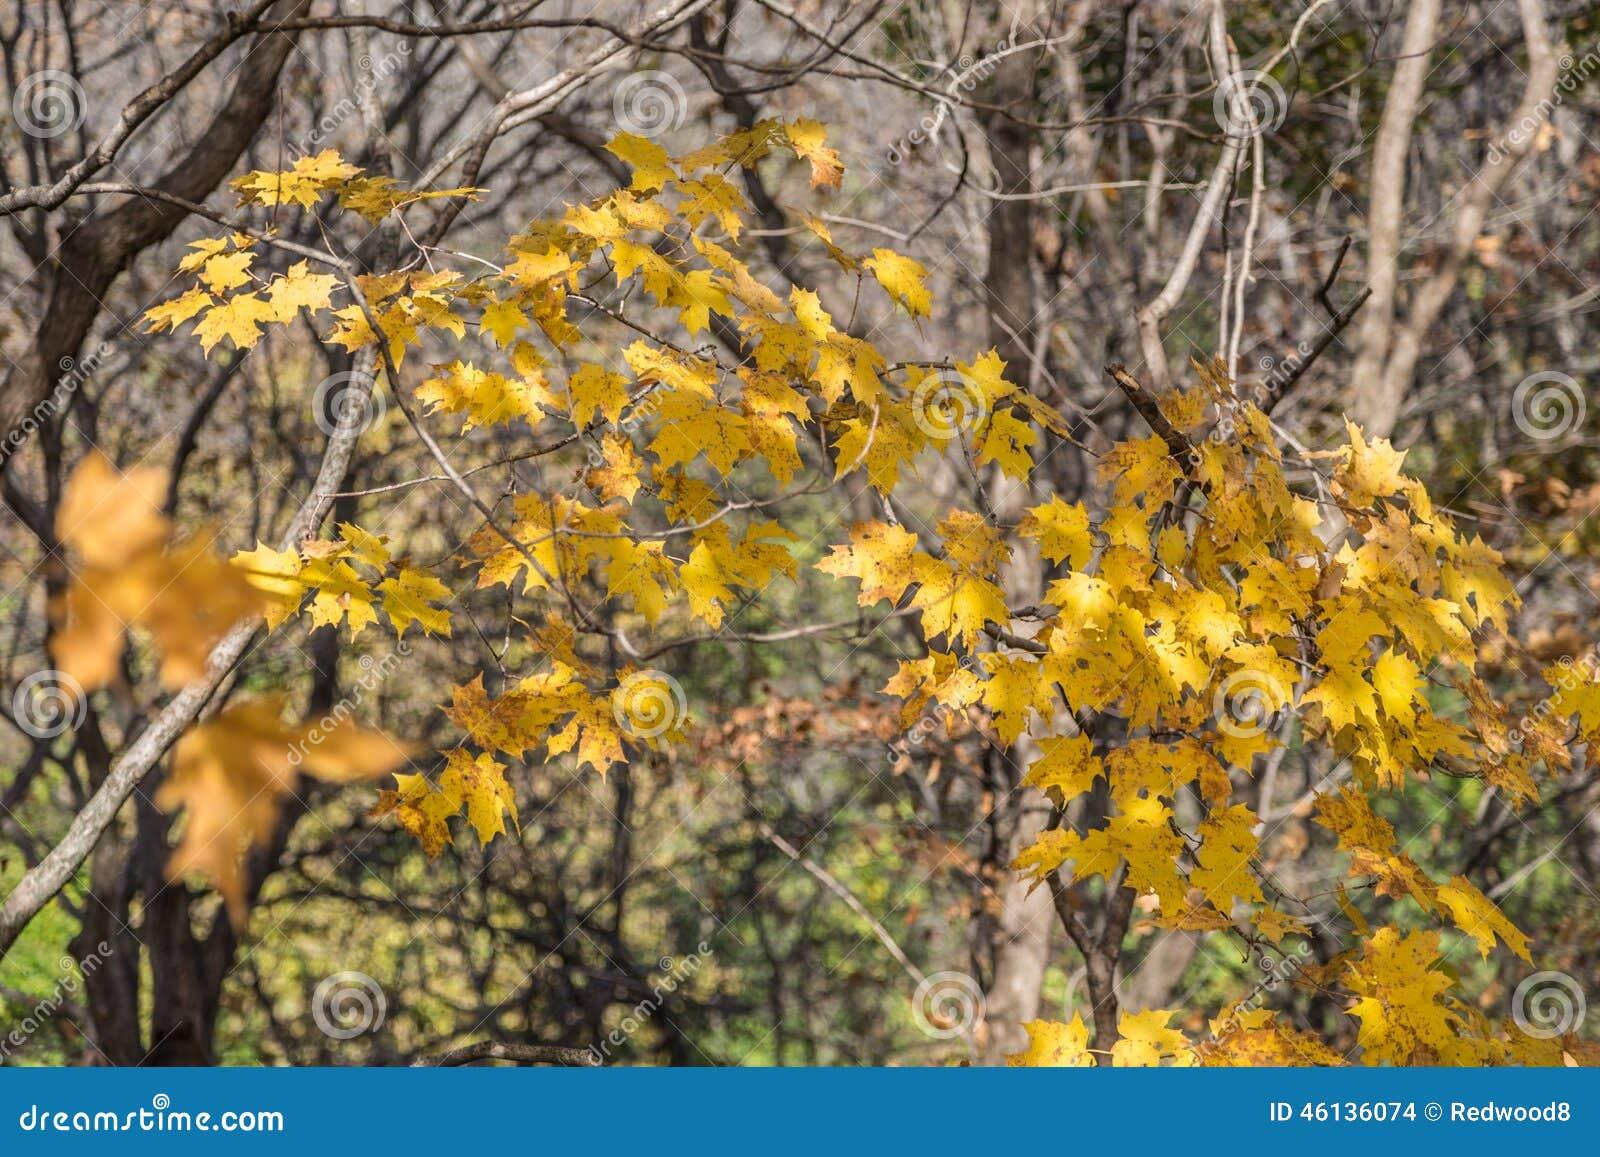 Lingering Golden Yellow Autumn Leaves